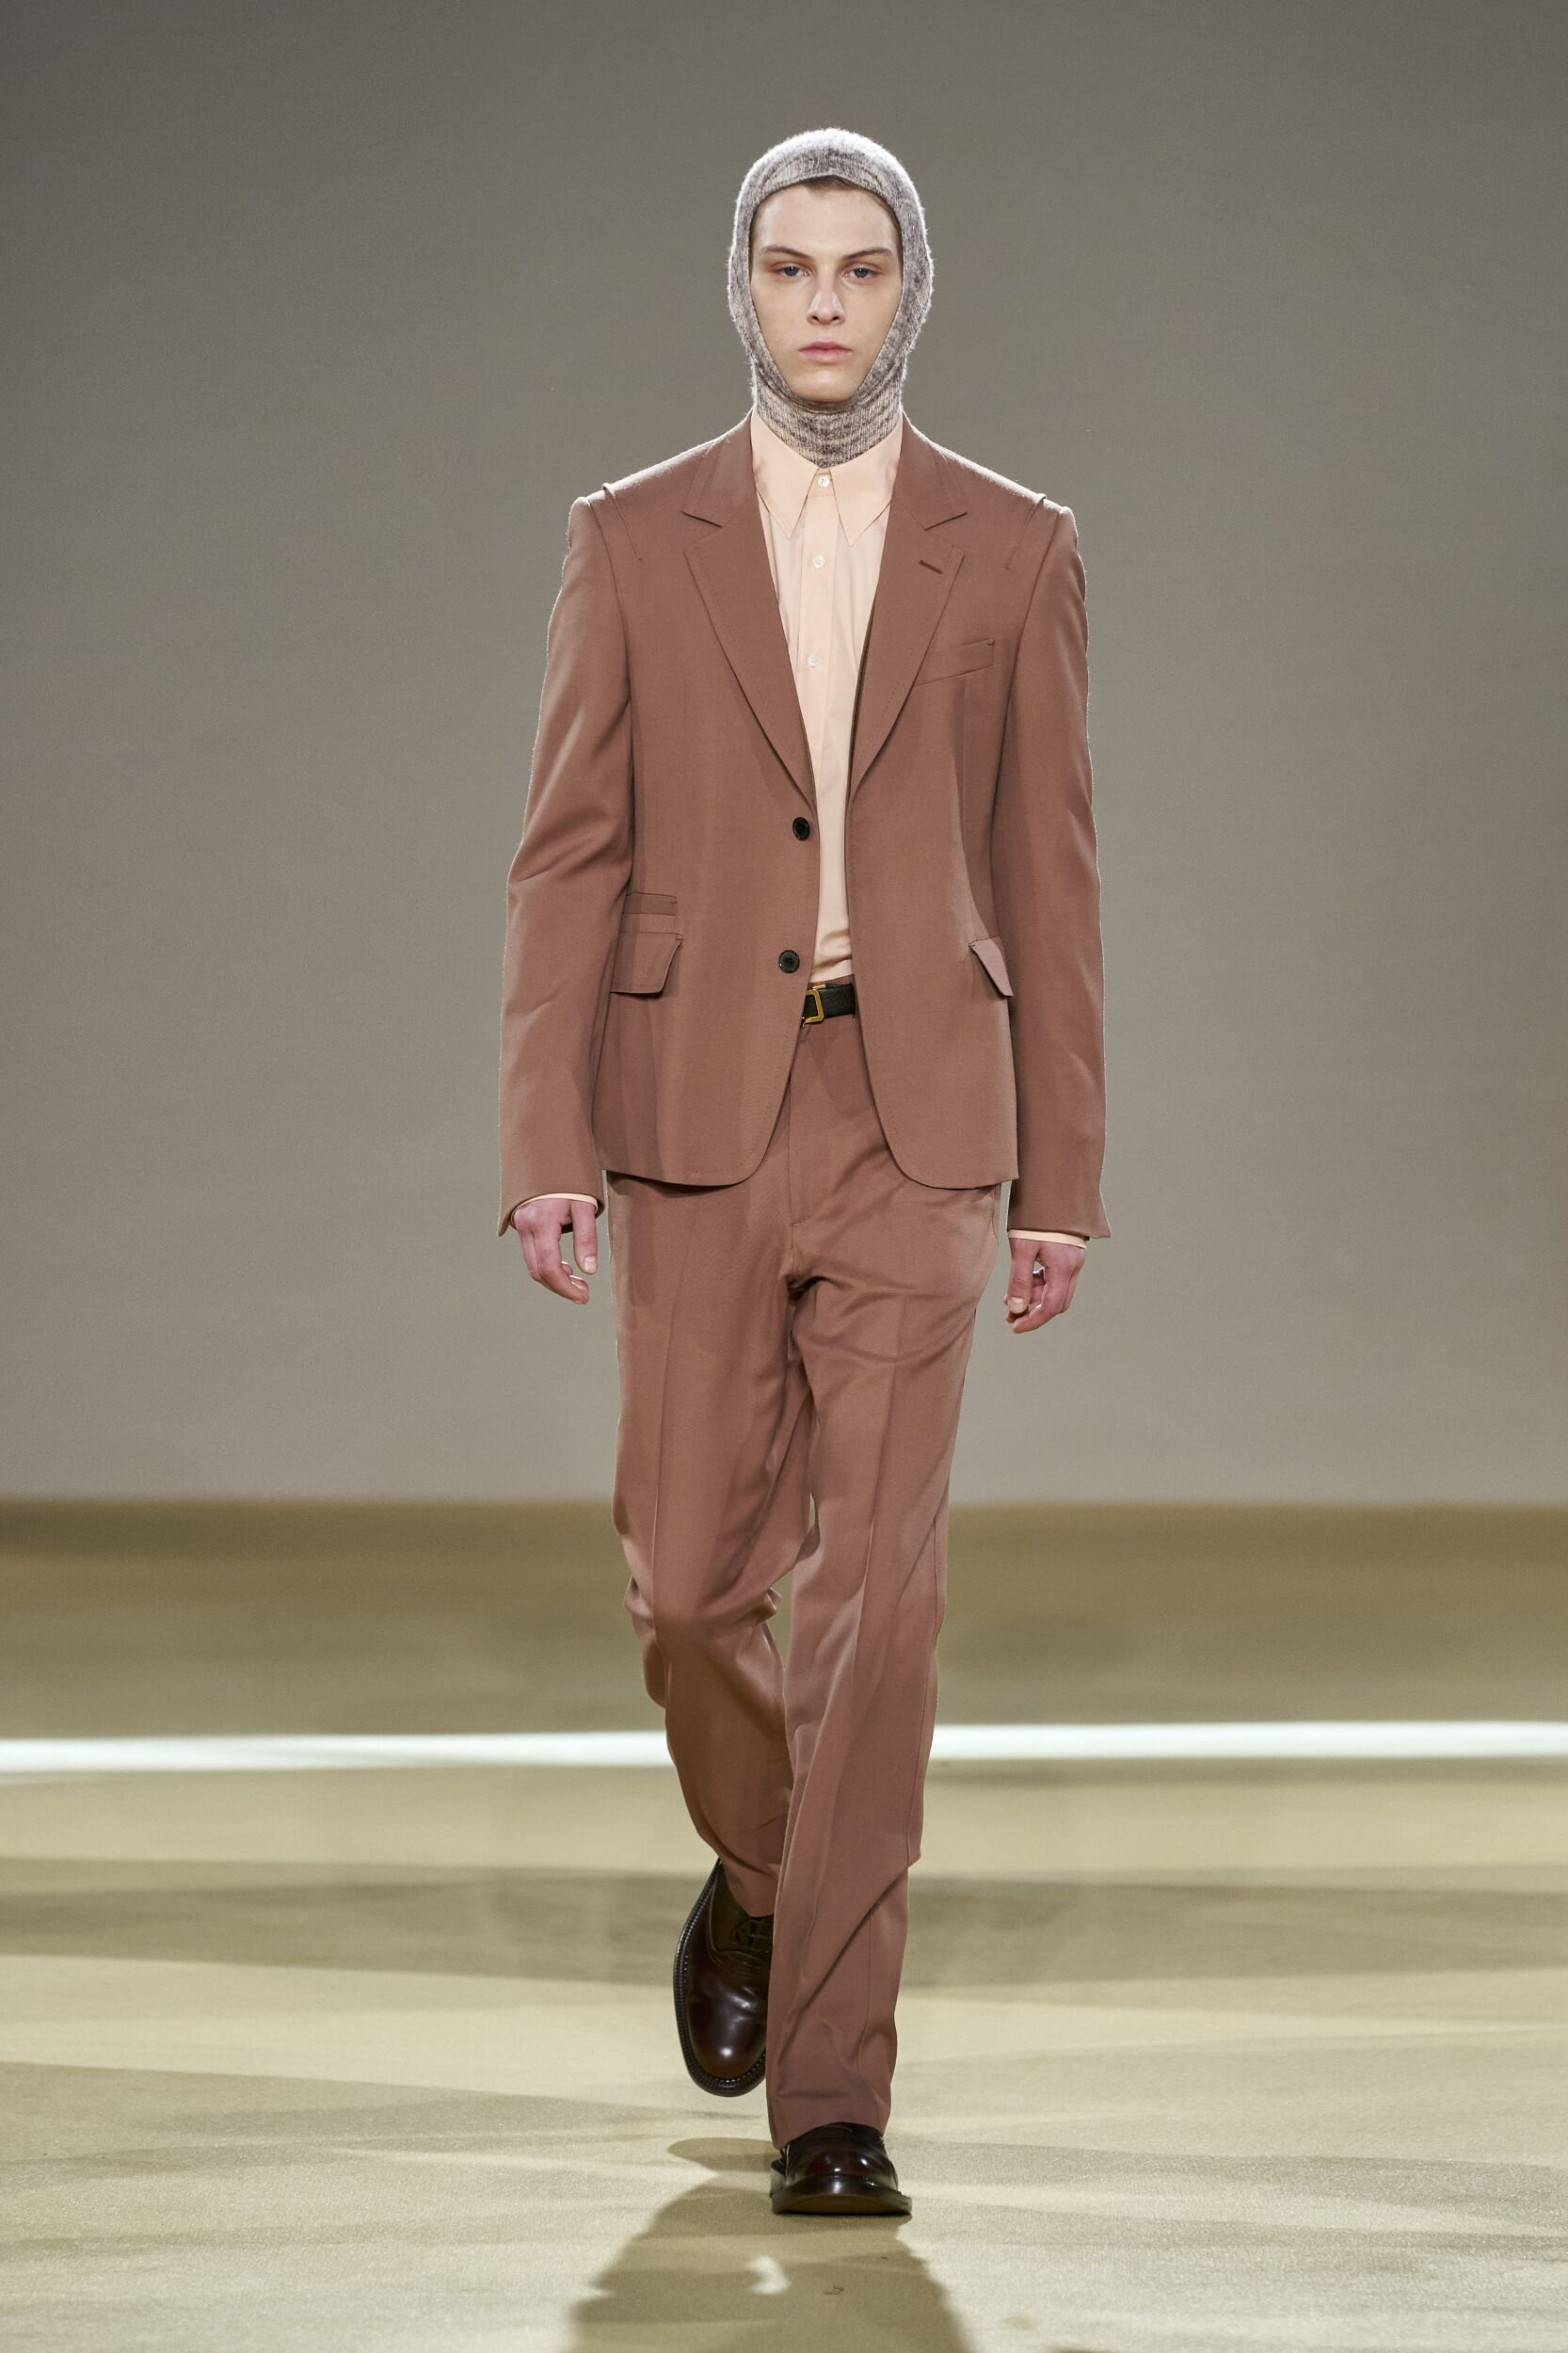 Salvatore Ferragamo Men's Collection 2020-21